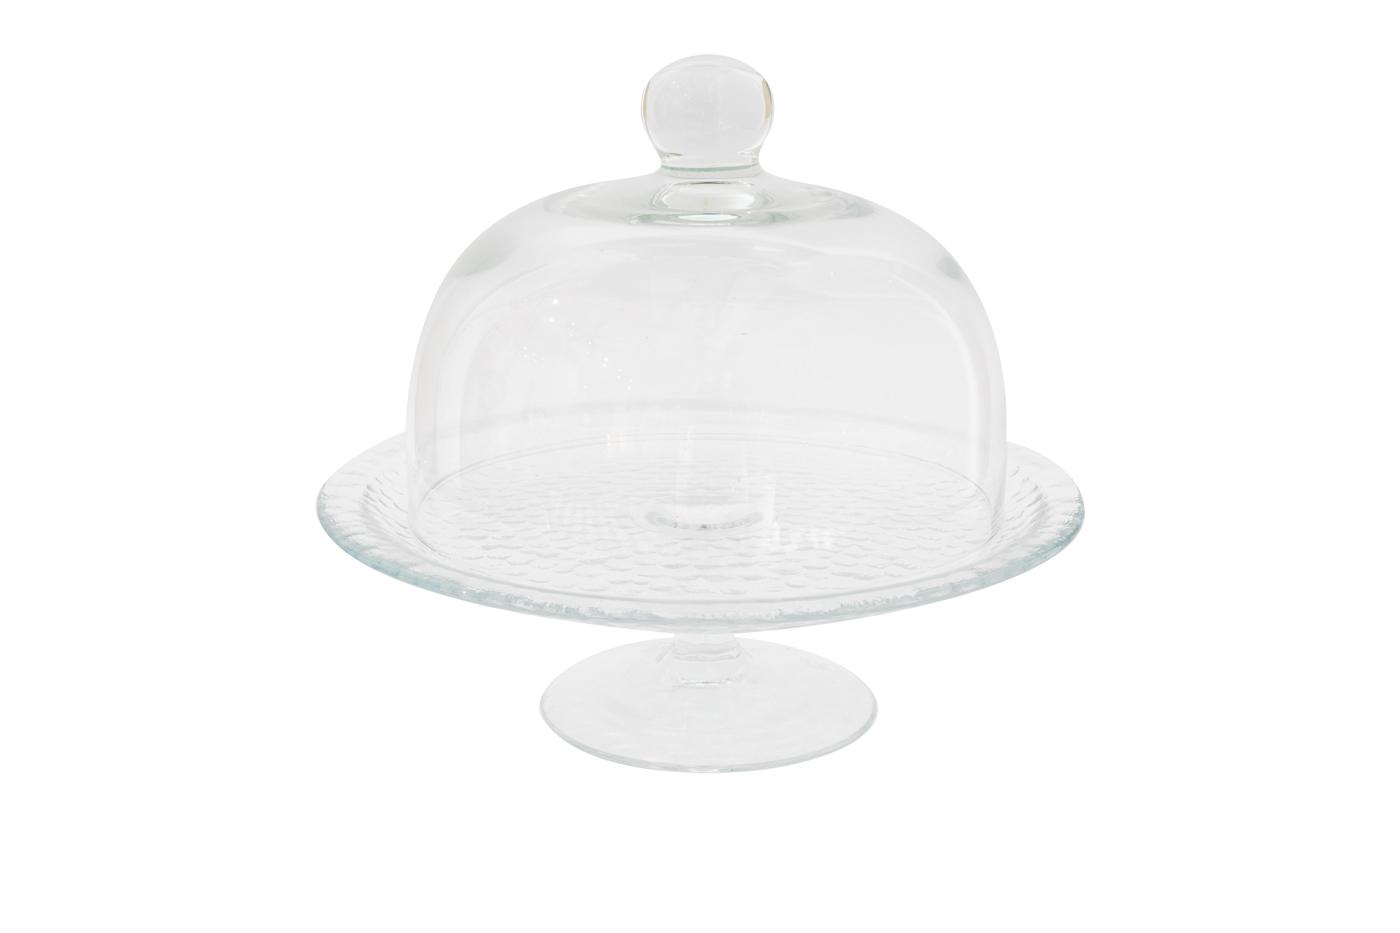 Soporte de vidrio para pasteles con tapa